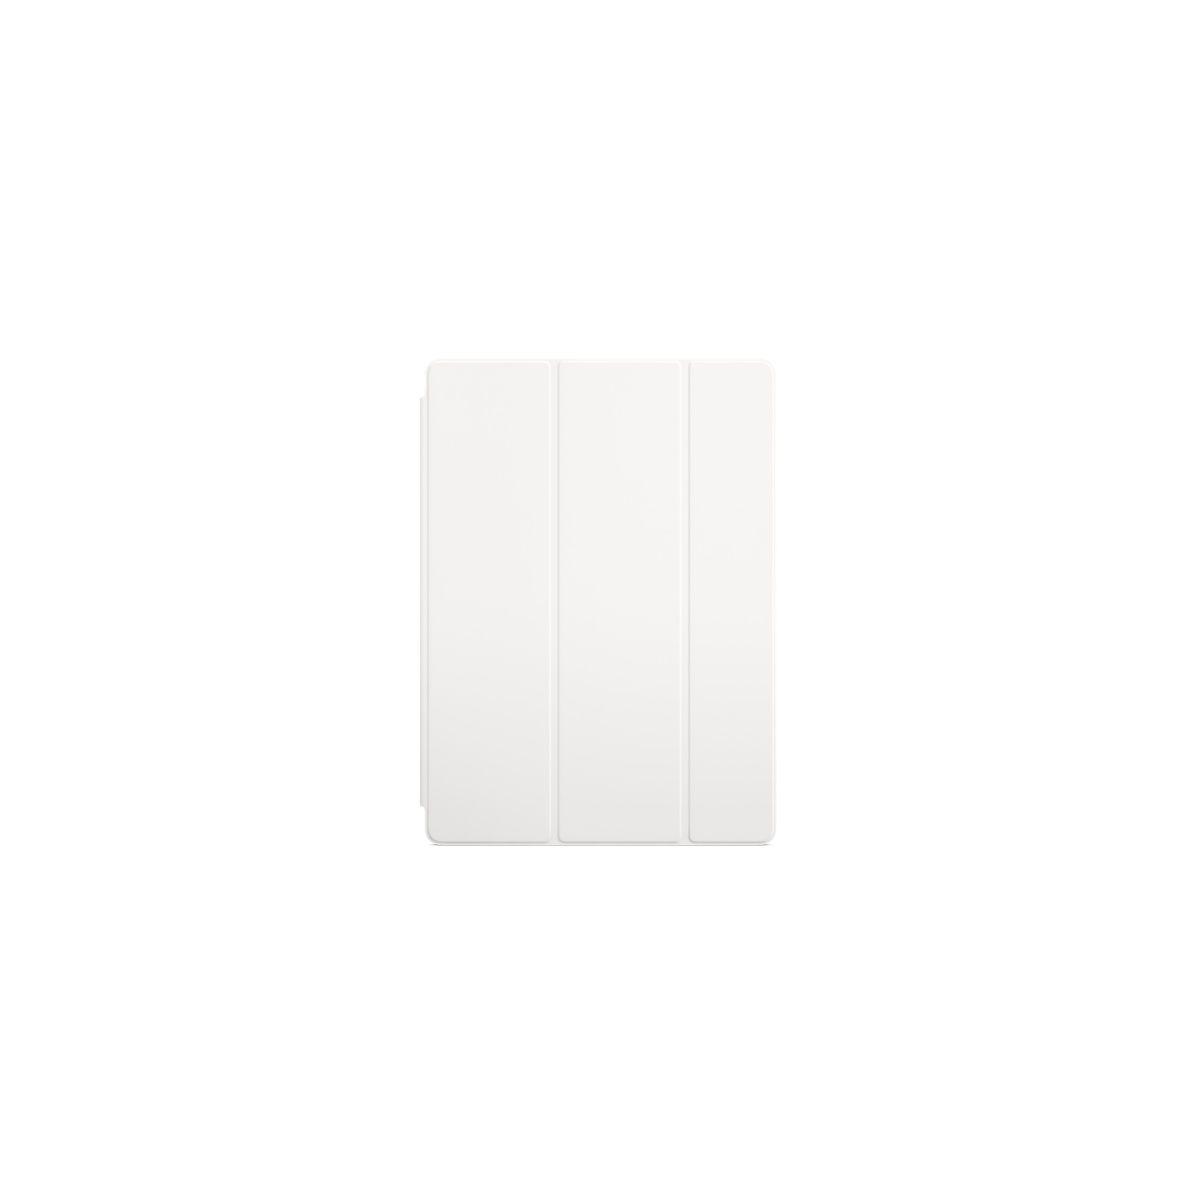 Etui tablette apple smart cover ipad pro 12.9 blanc - livraison offerte : code liv (photo)